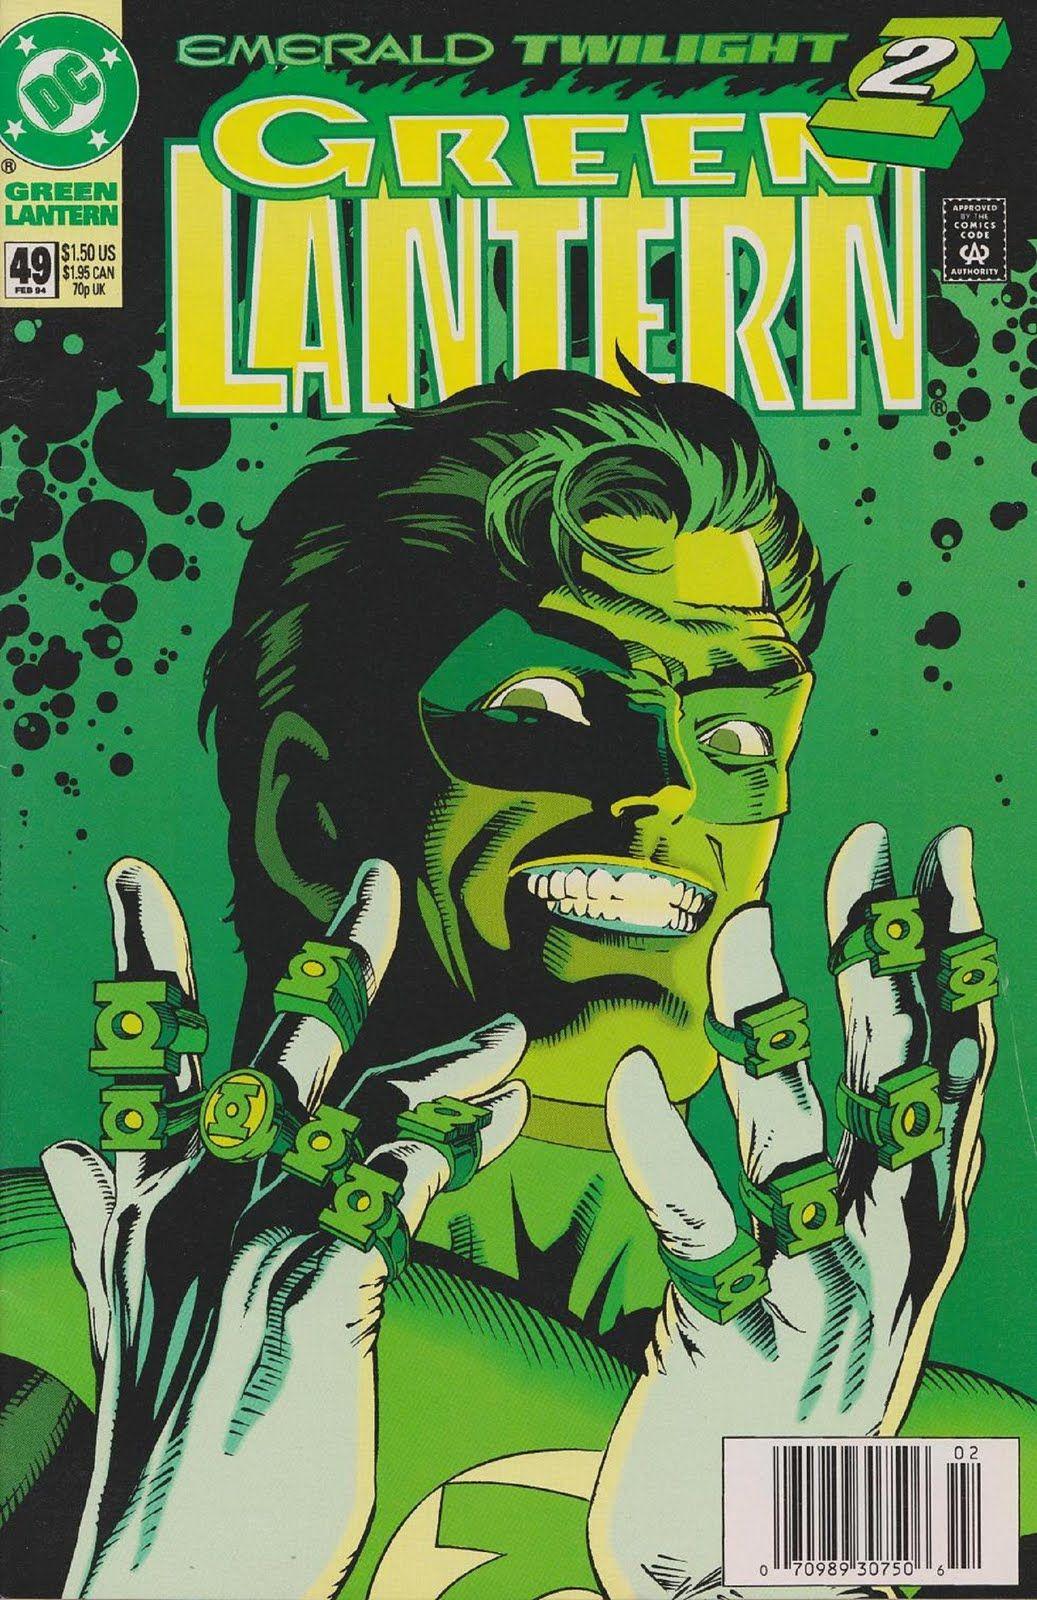 green lantern parallax cover - Bing images | Green lantern, Cover ...